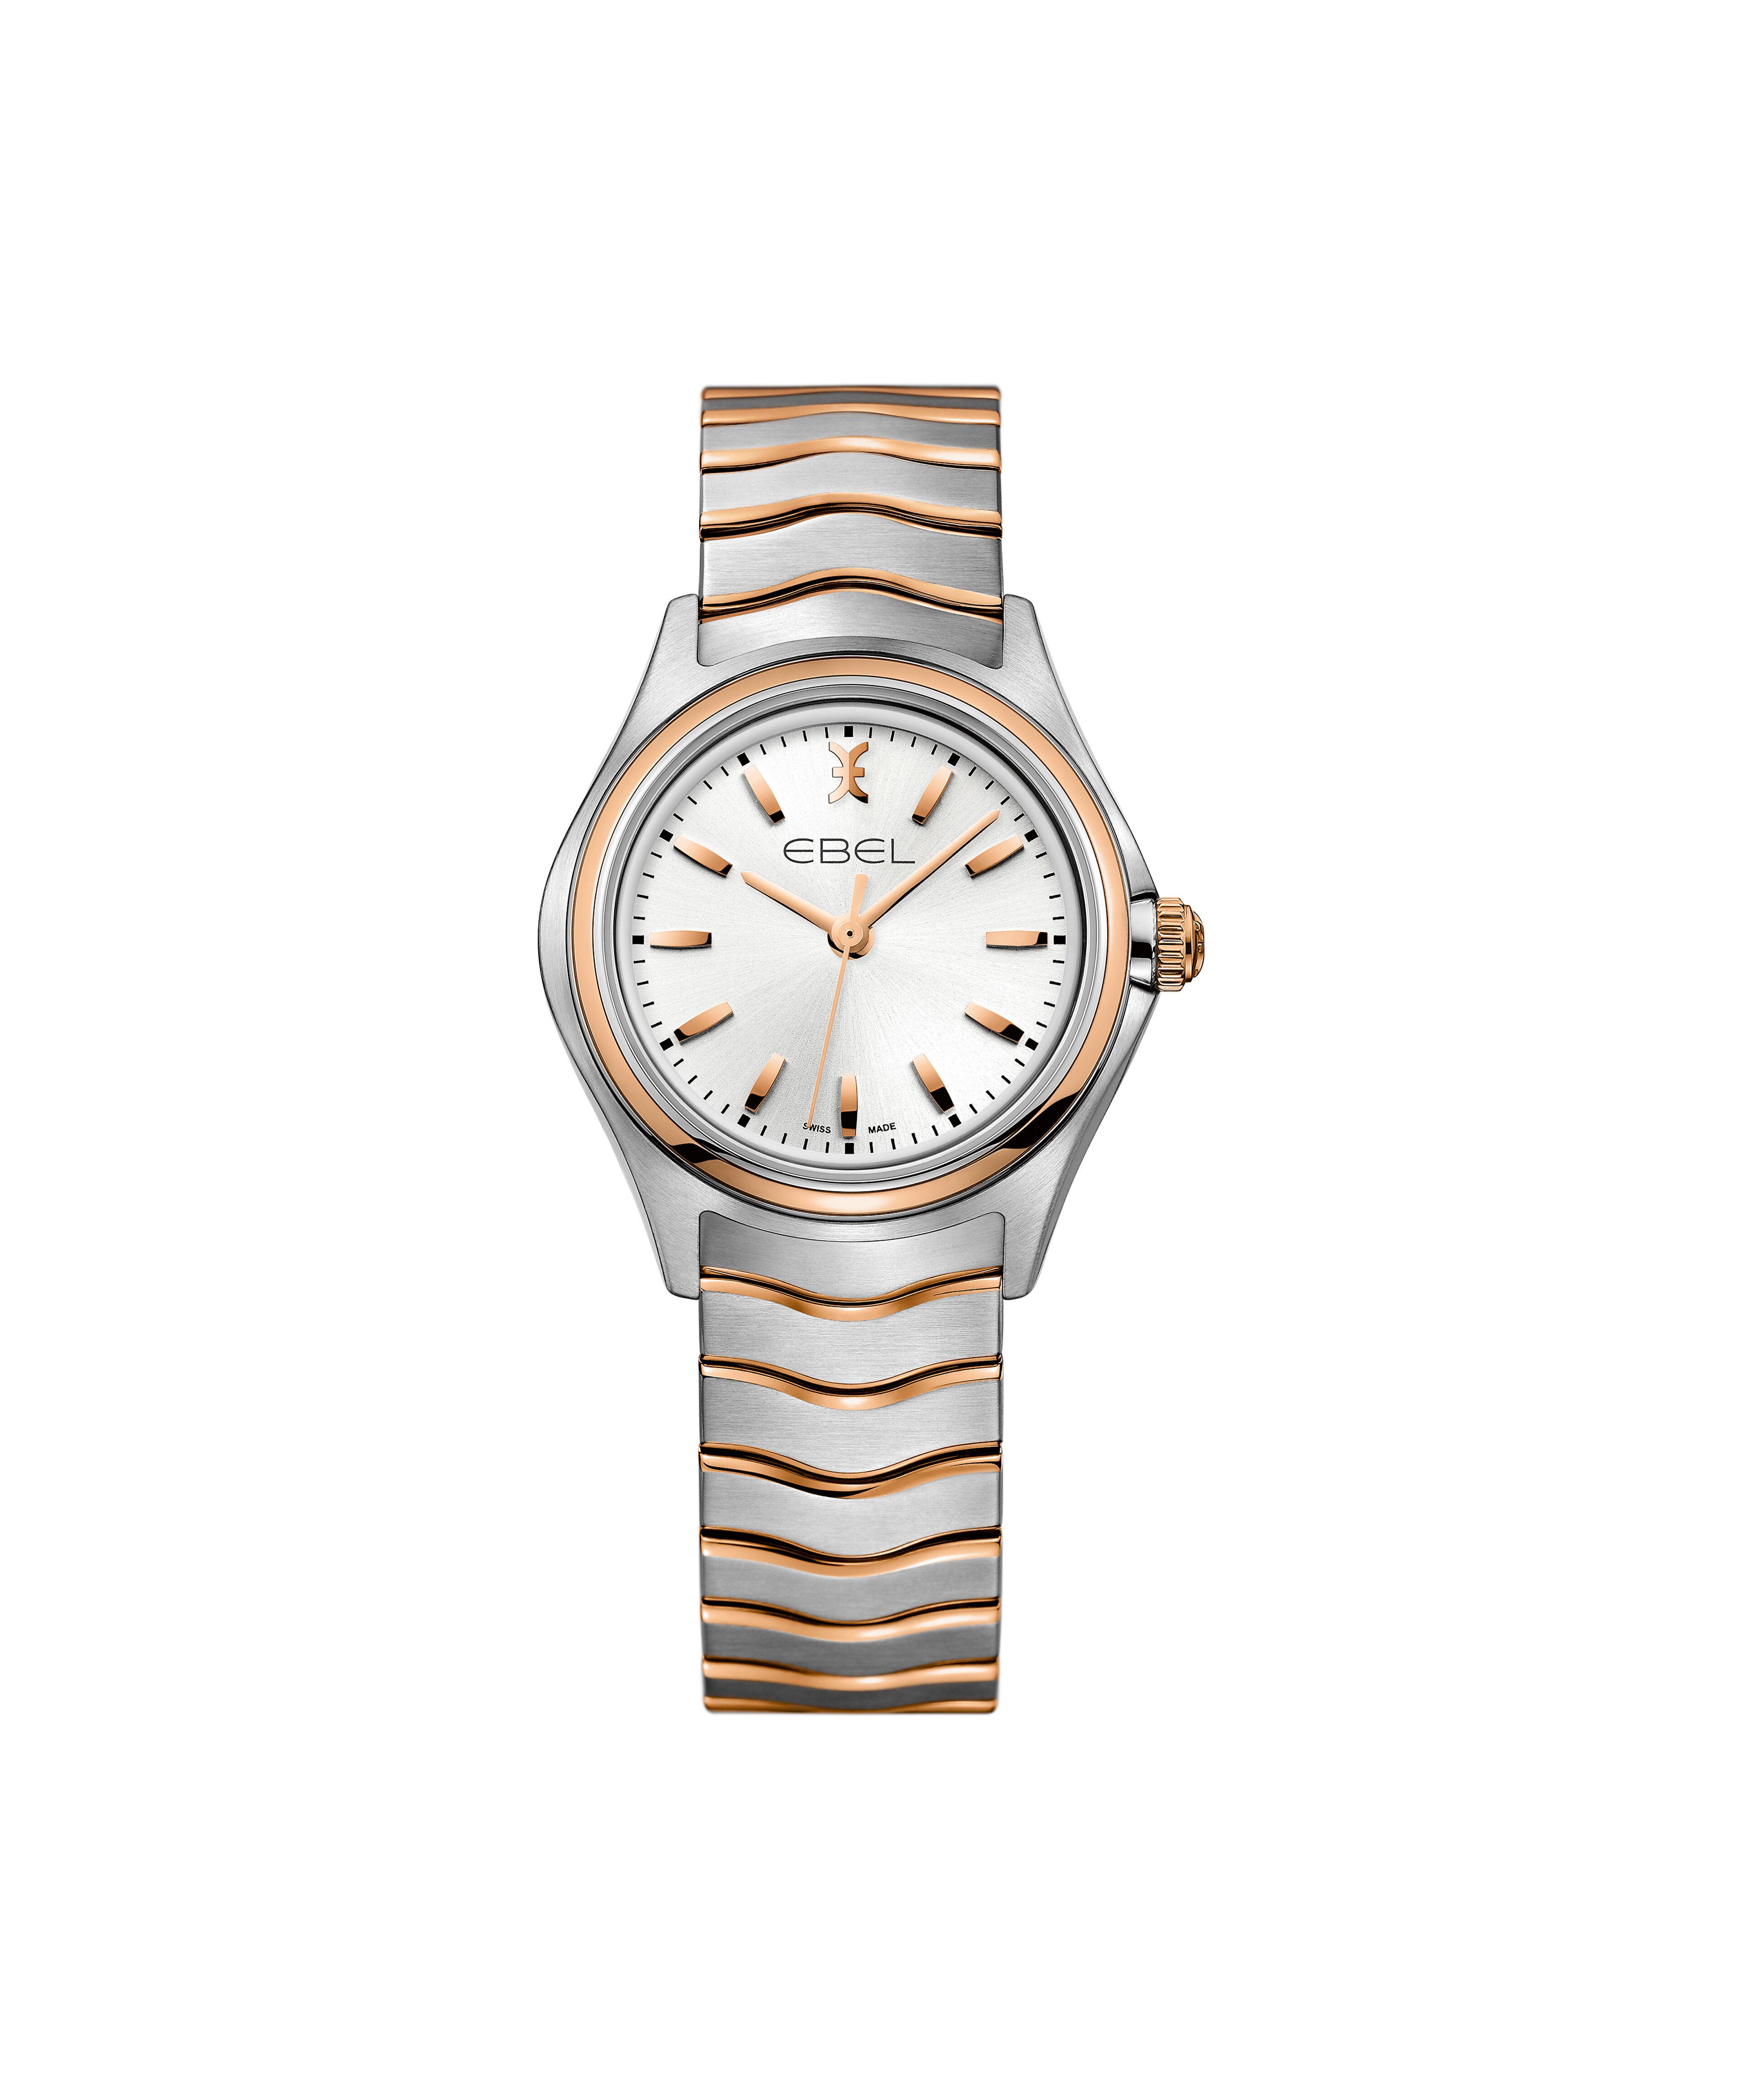 Omega Watches Fake